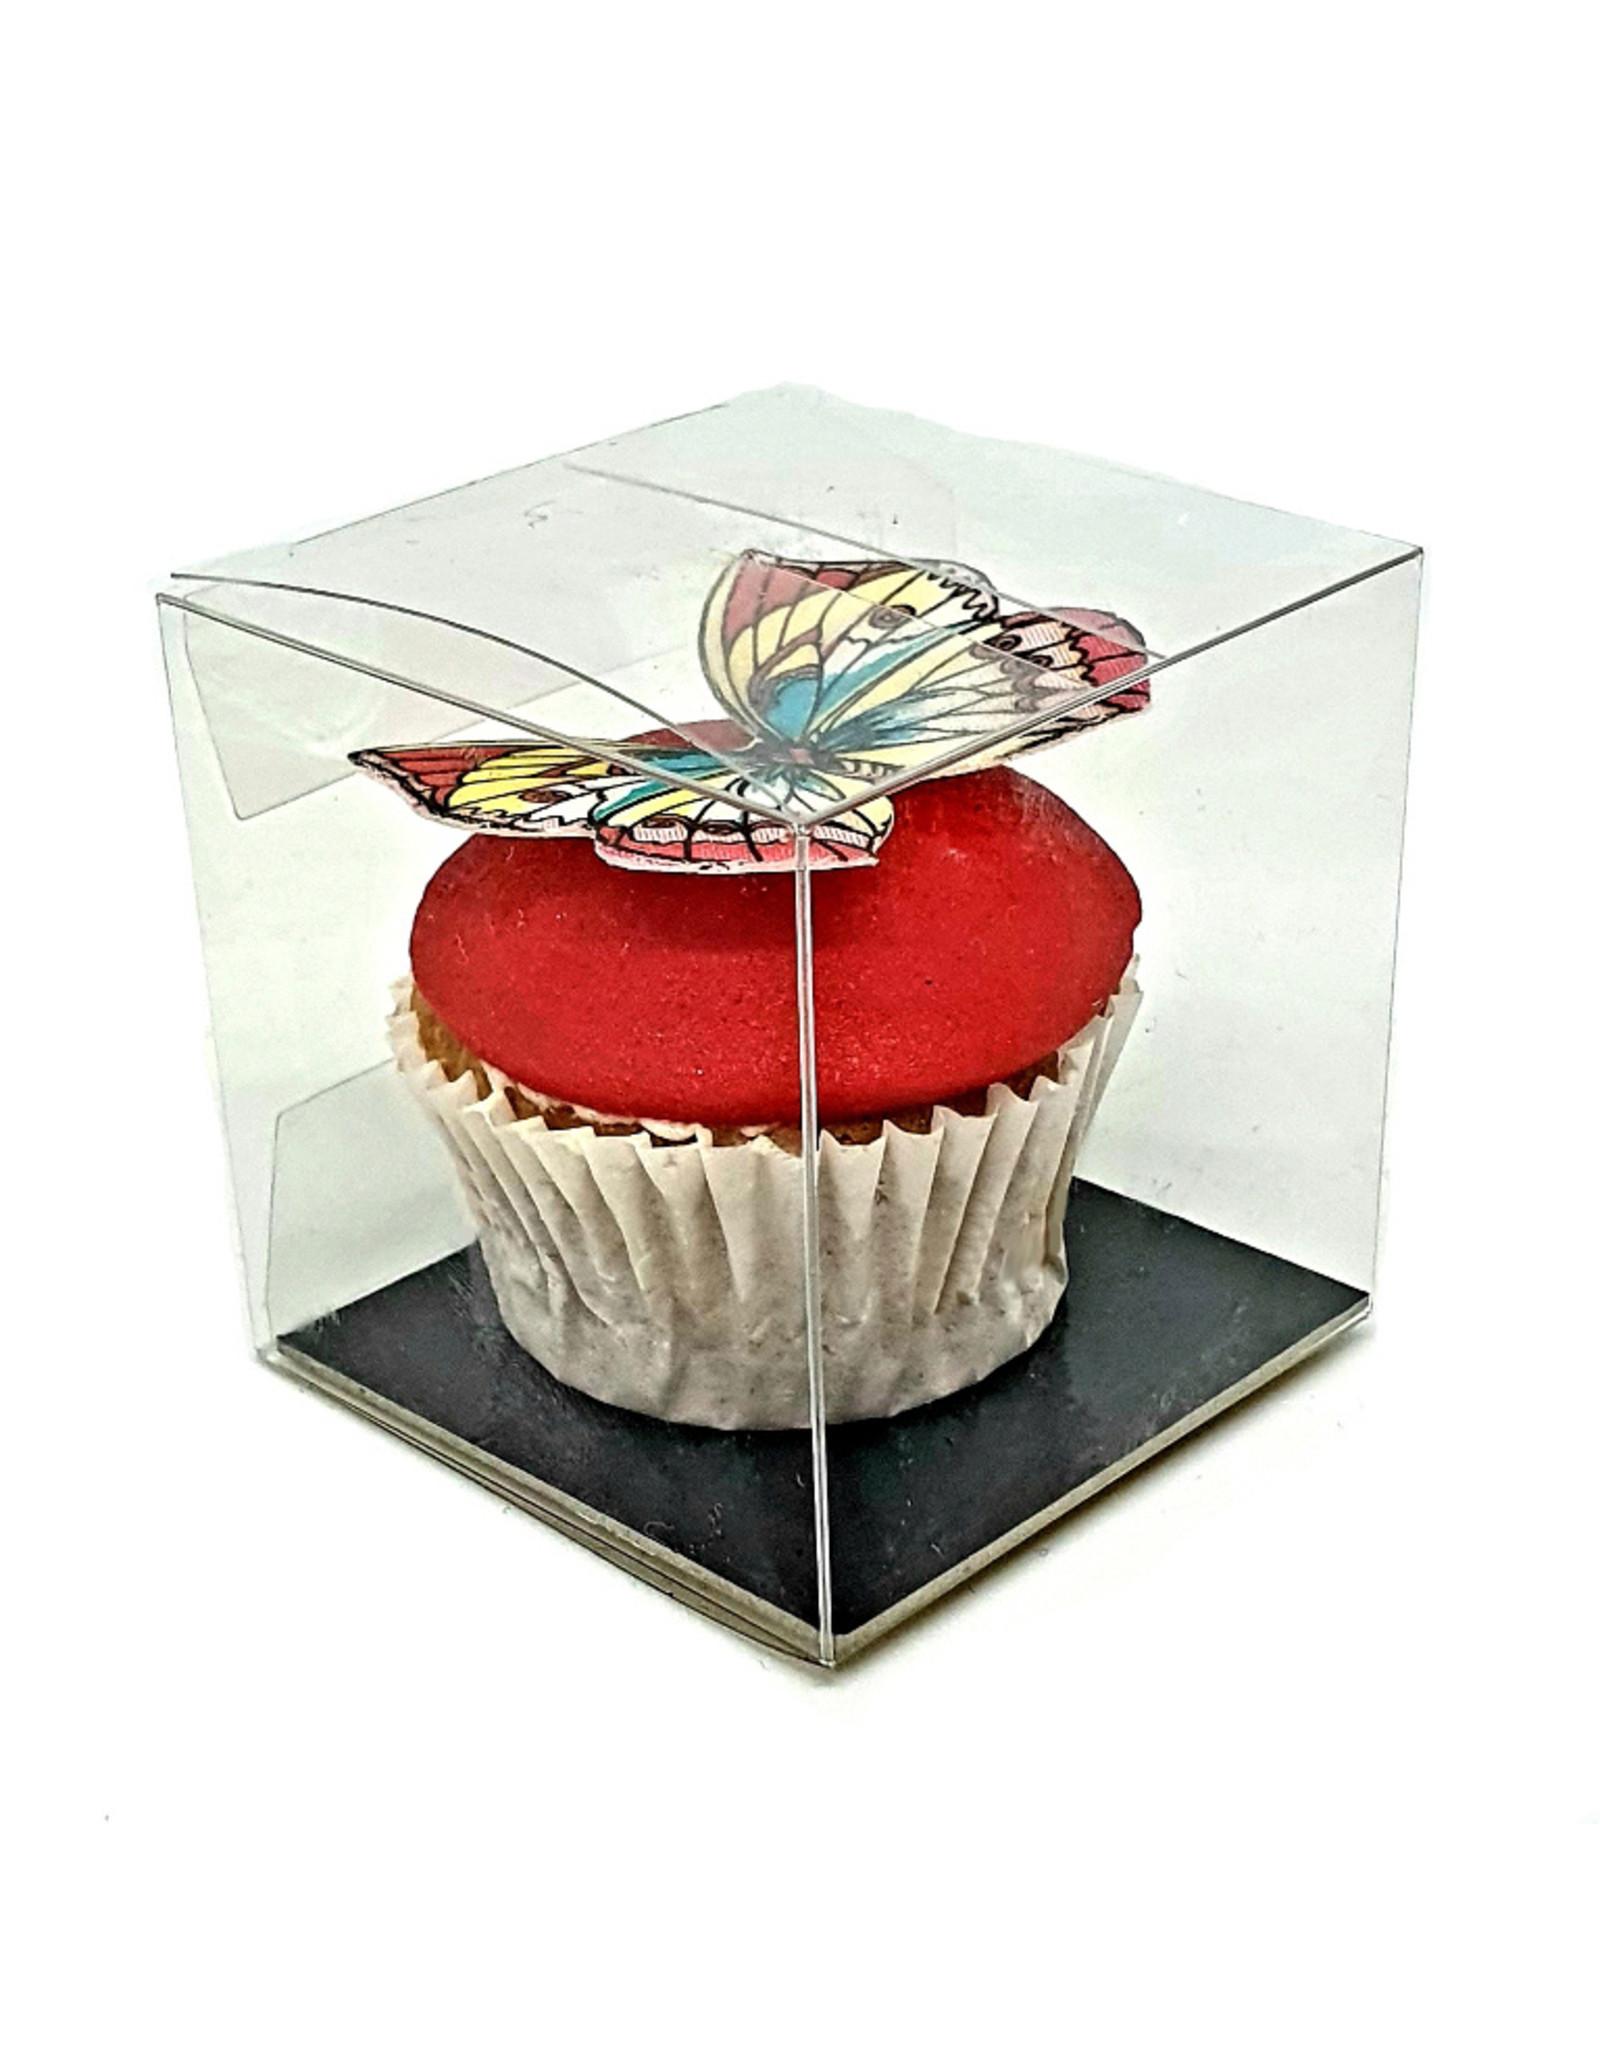 Transparant kubusdoosje voor 1 minicupcake (per 100 stuks)